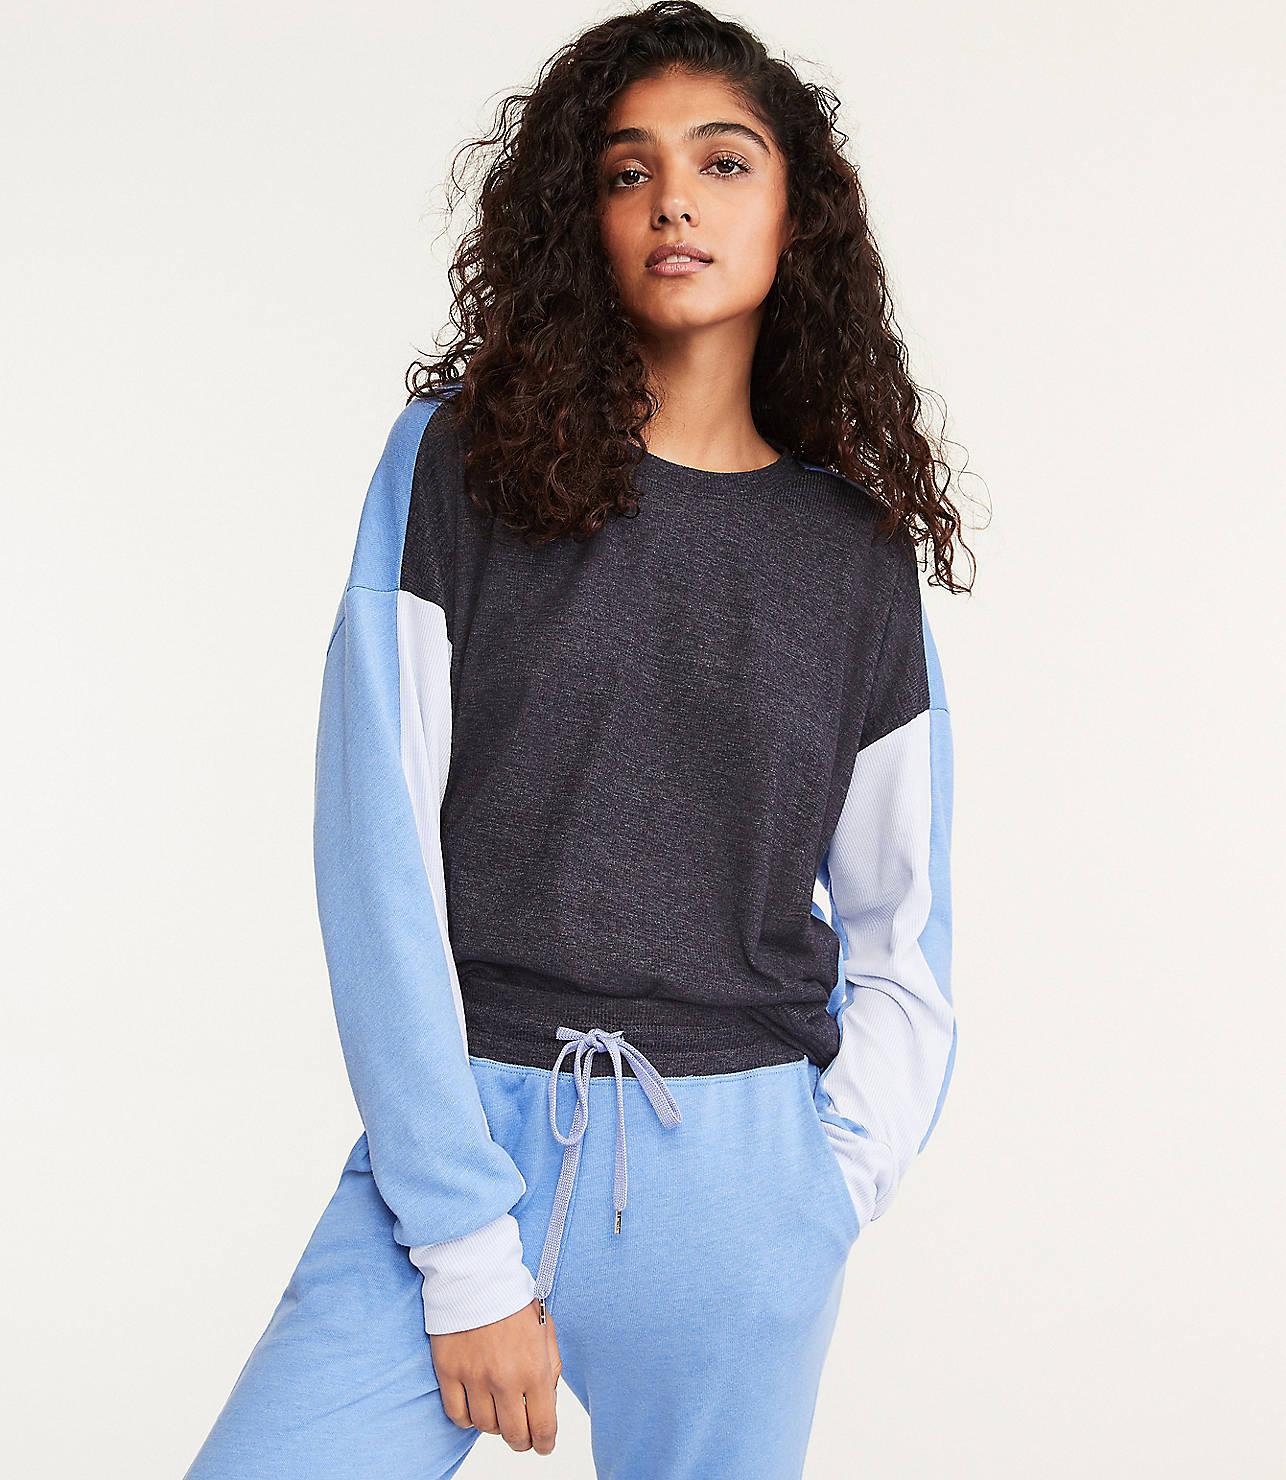 Sundry Colorblock Sweatshirt by Lou & Grey